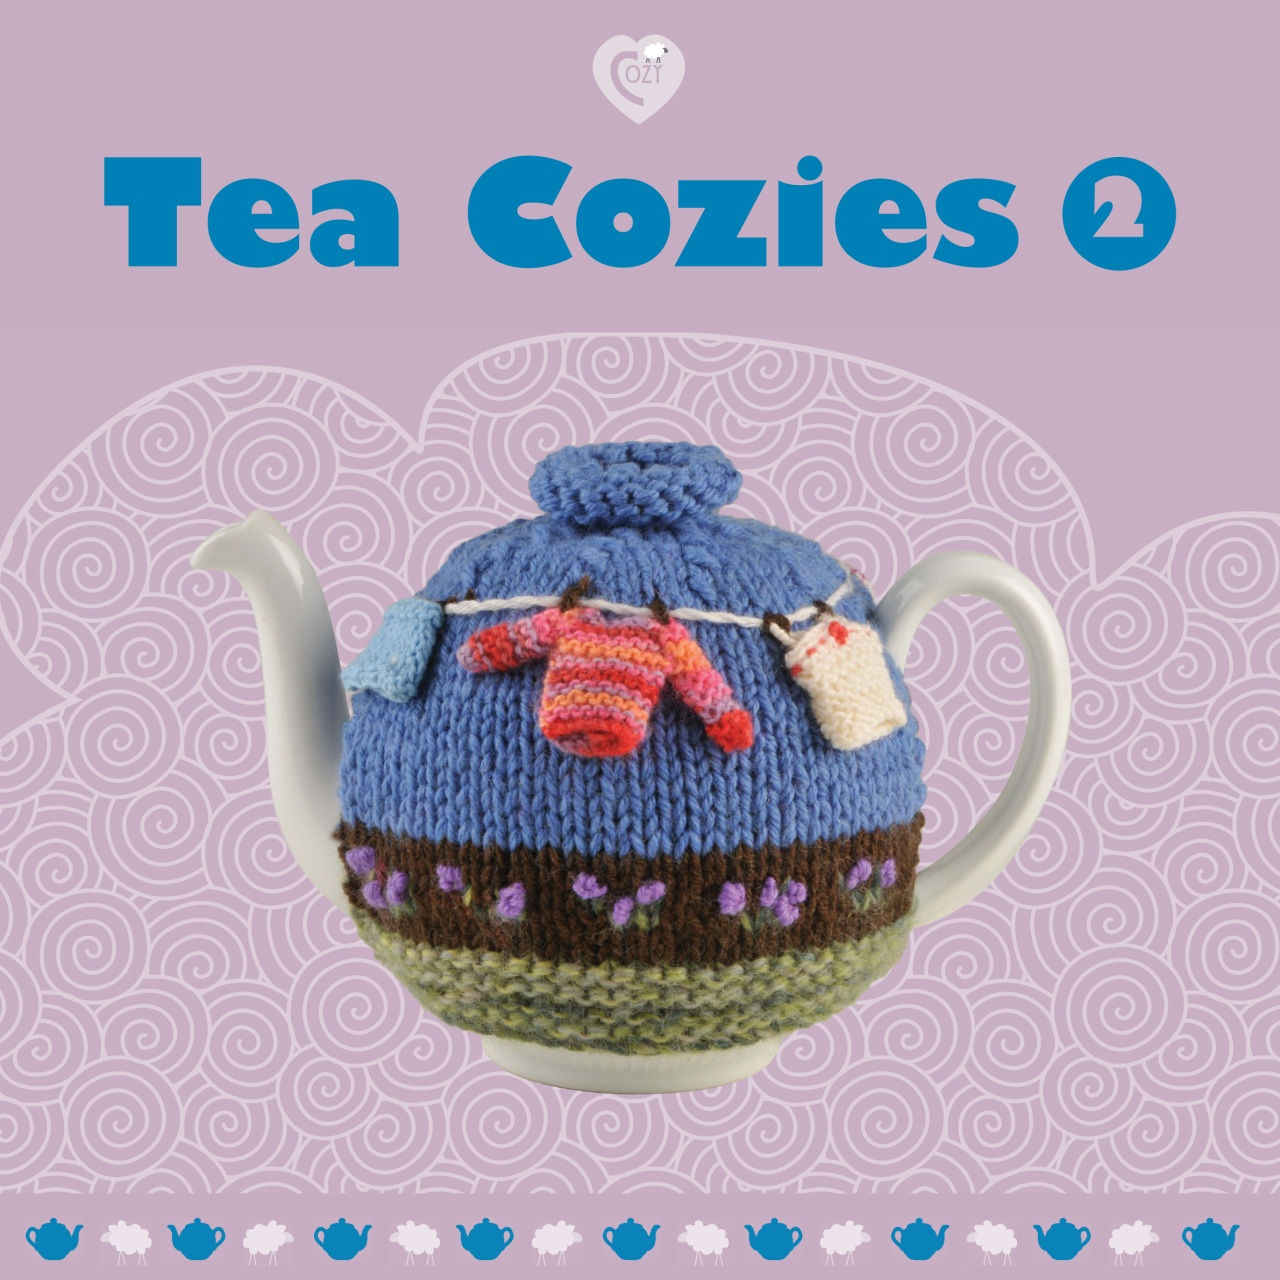 Knitting Magazine Tea Cozies 2 Subscriptions Pocketmags